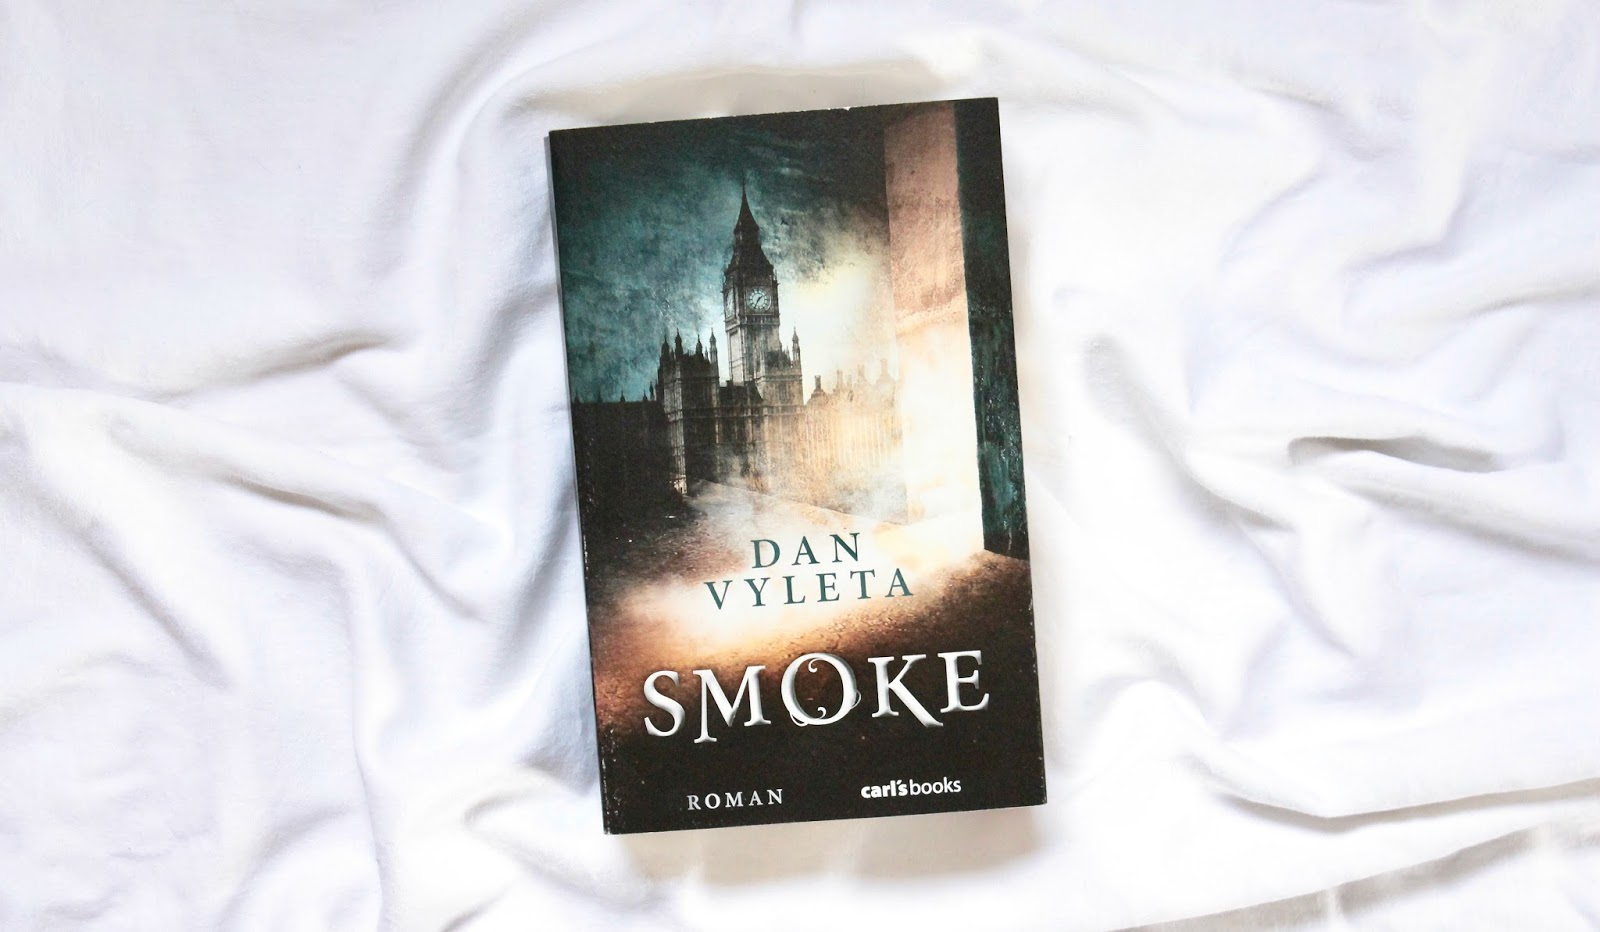 Rezension] Smoke - Dan Vyleta - Noch mehr Bücher